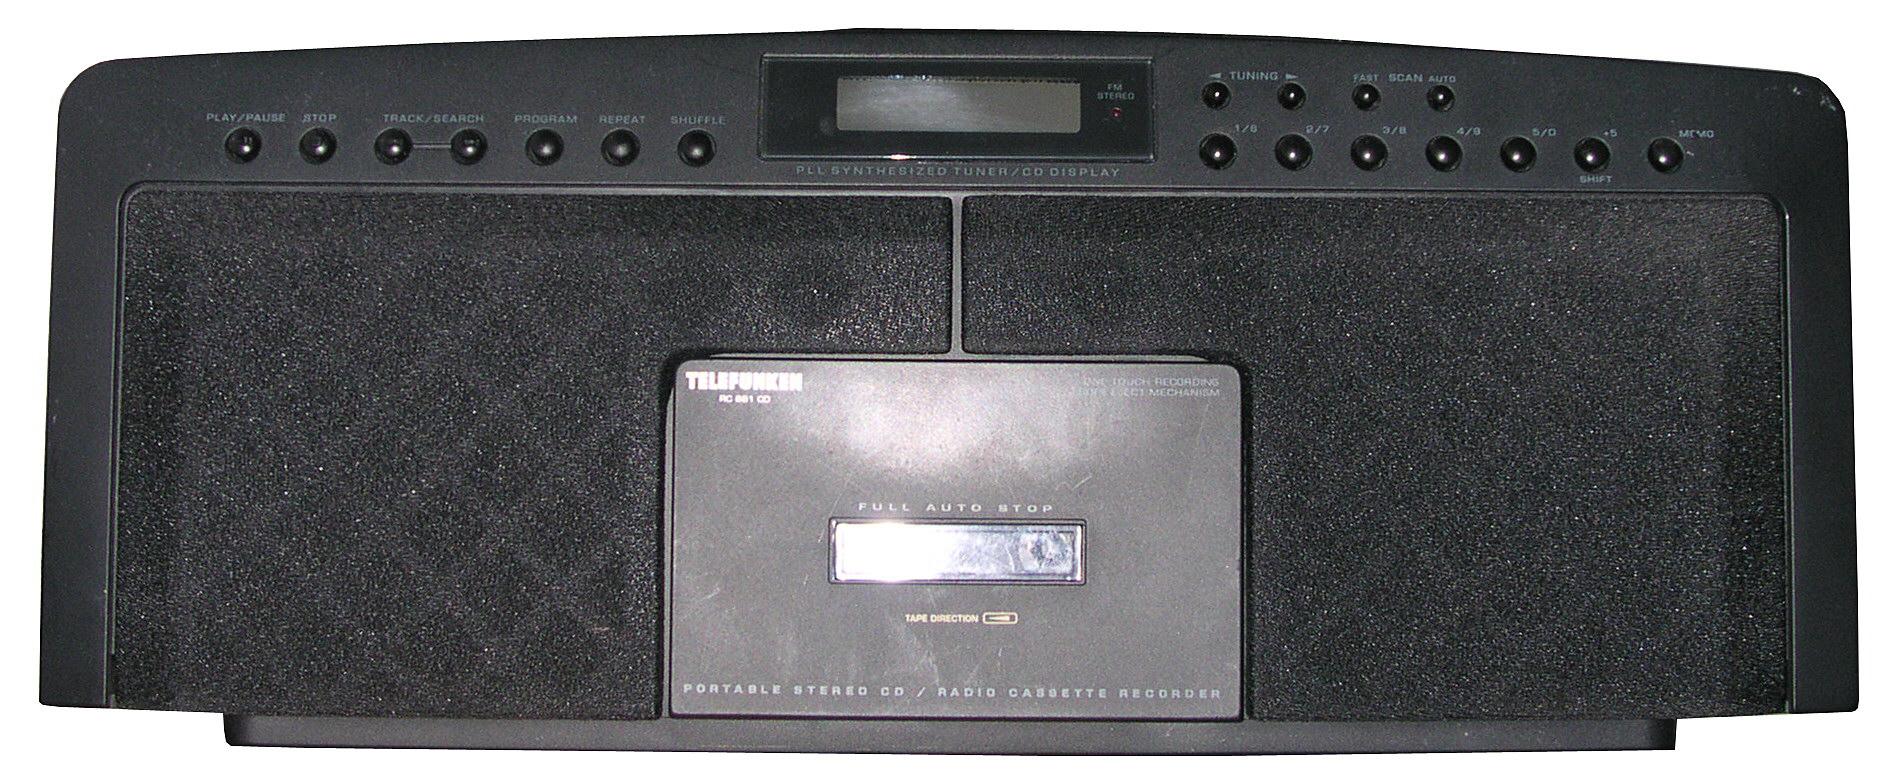 FileTelefunken RC 881 CDJPG